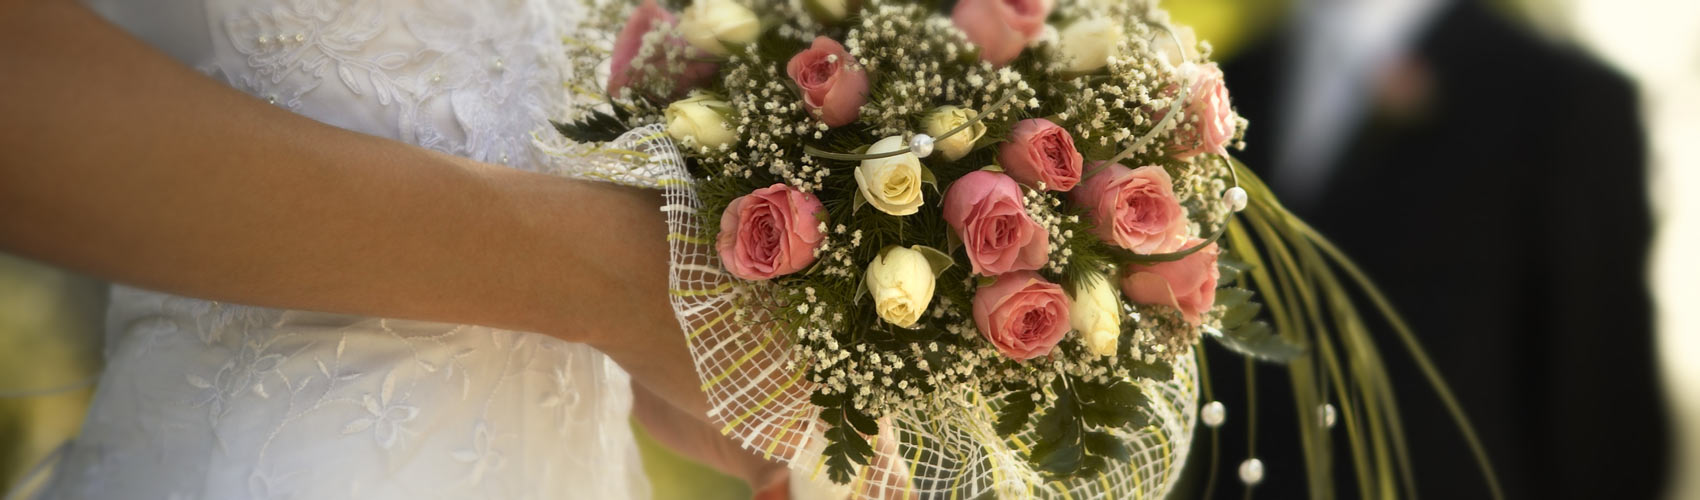 main-weddings